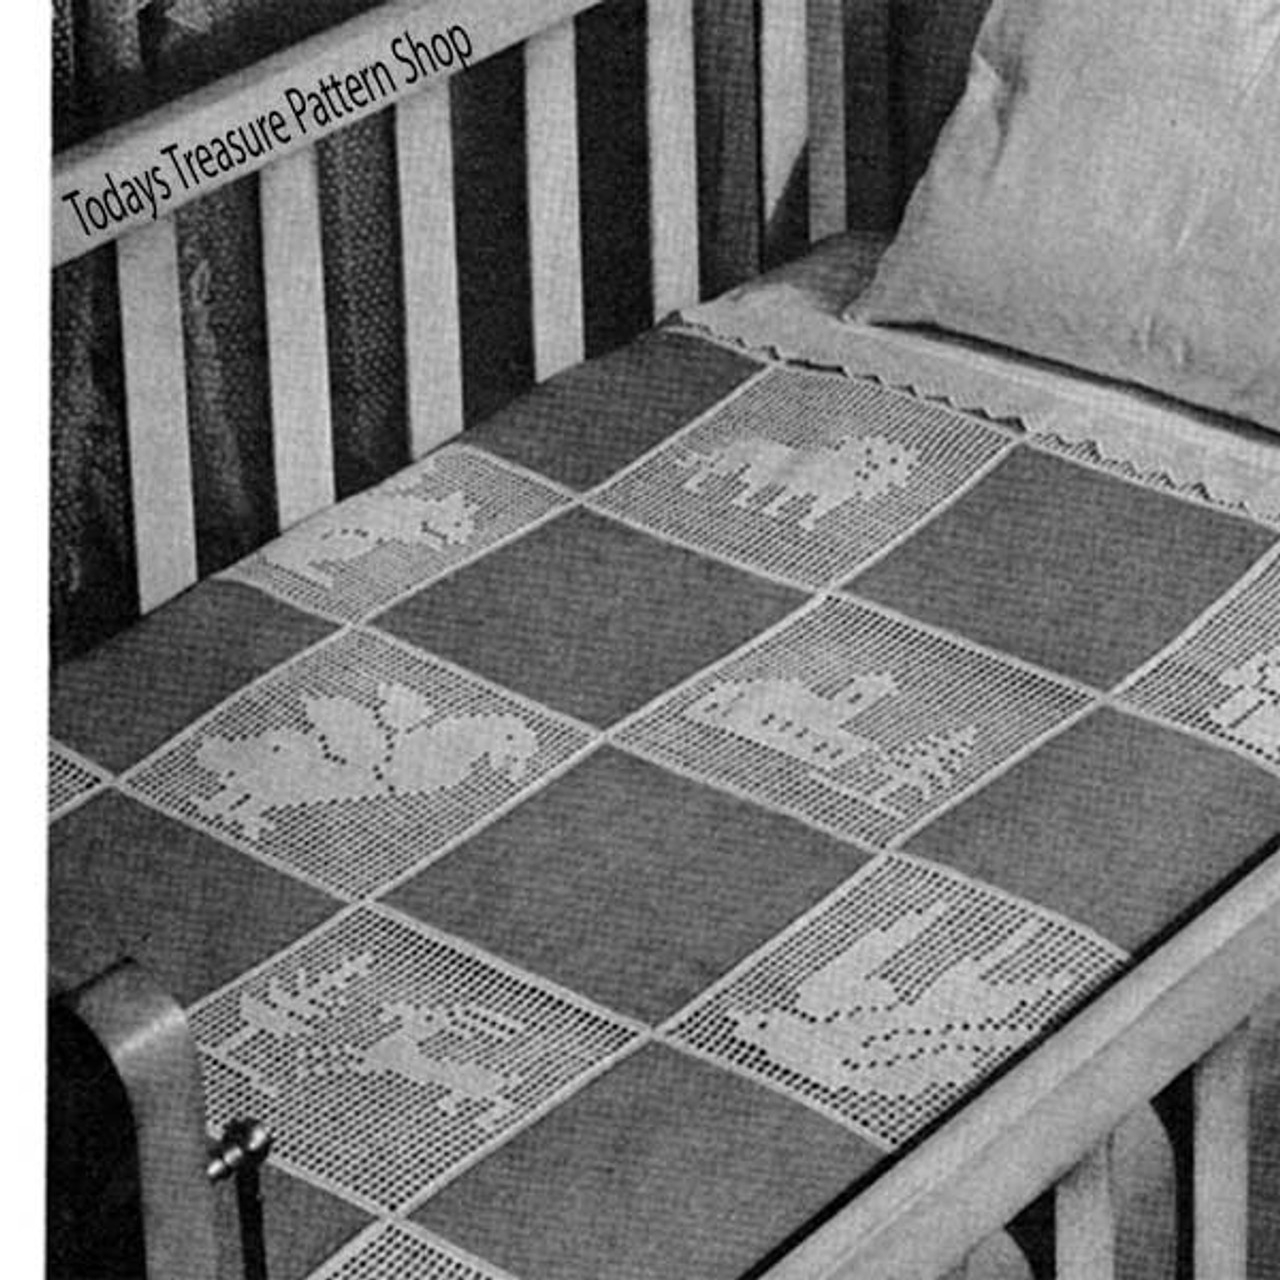 Filet Crochet Baby Blanket Pattern in animal blocks